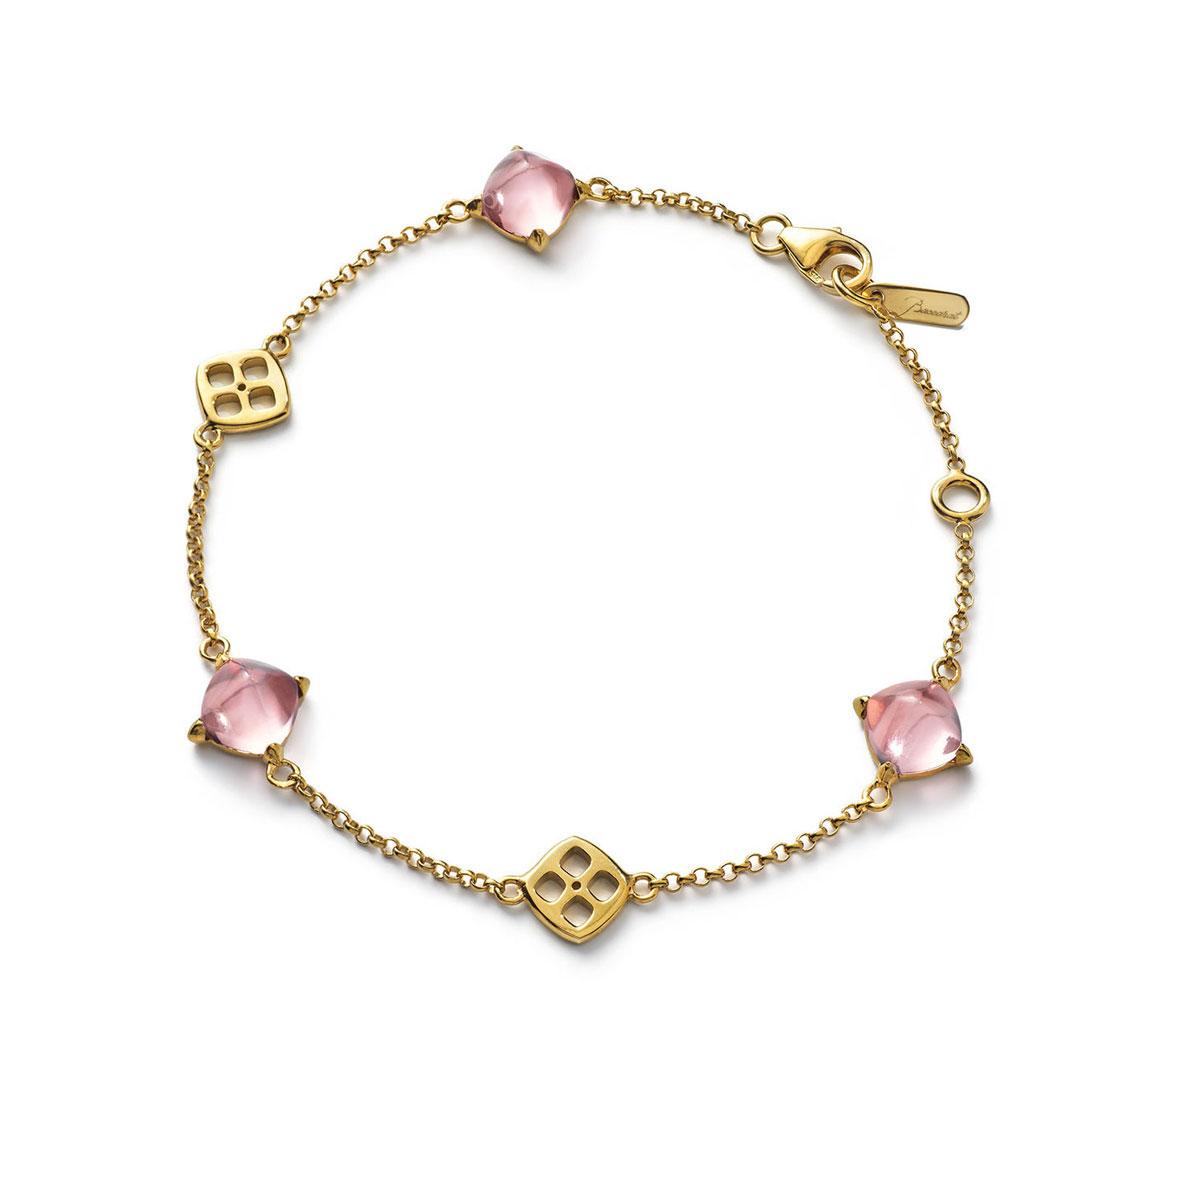 Baccarat Crystal Medicis Mini Chain Bracelet Vermeil Gold Pink